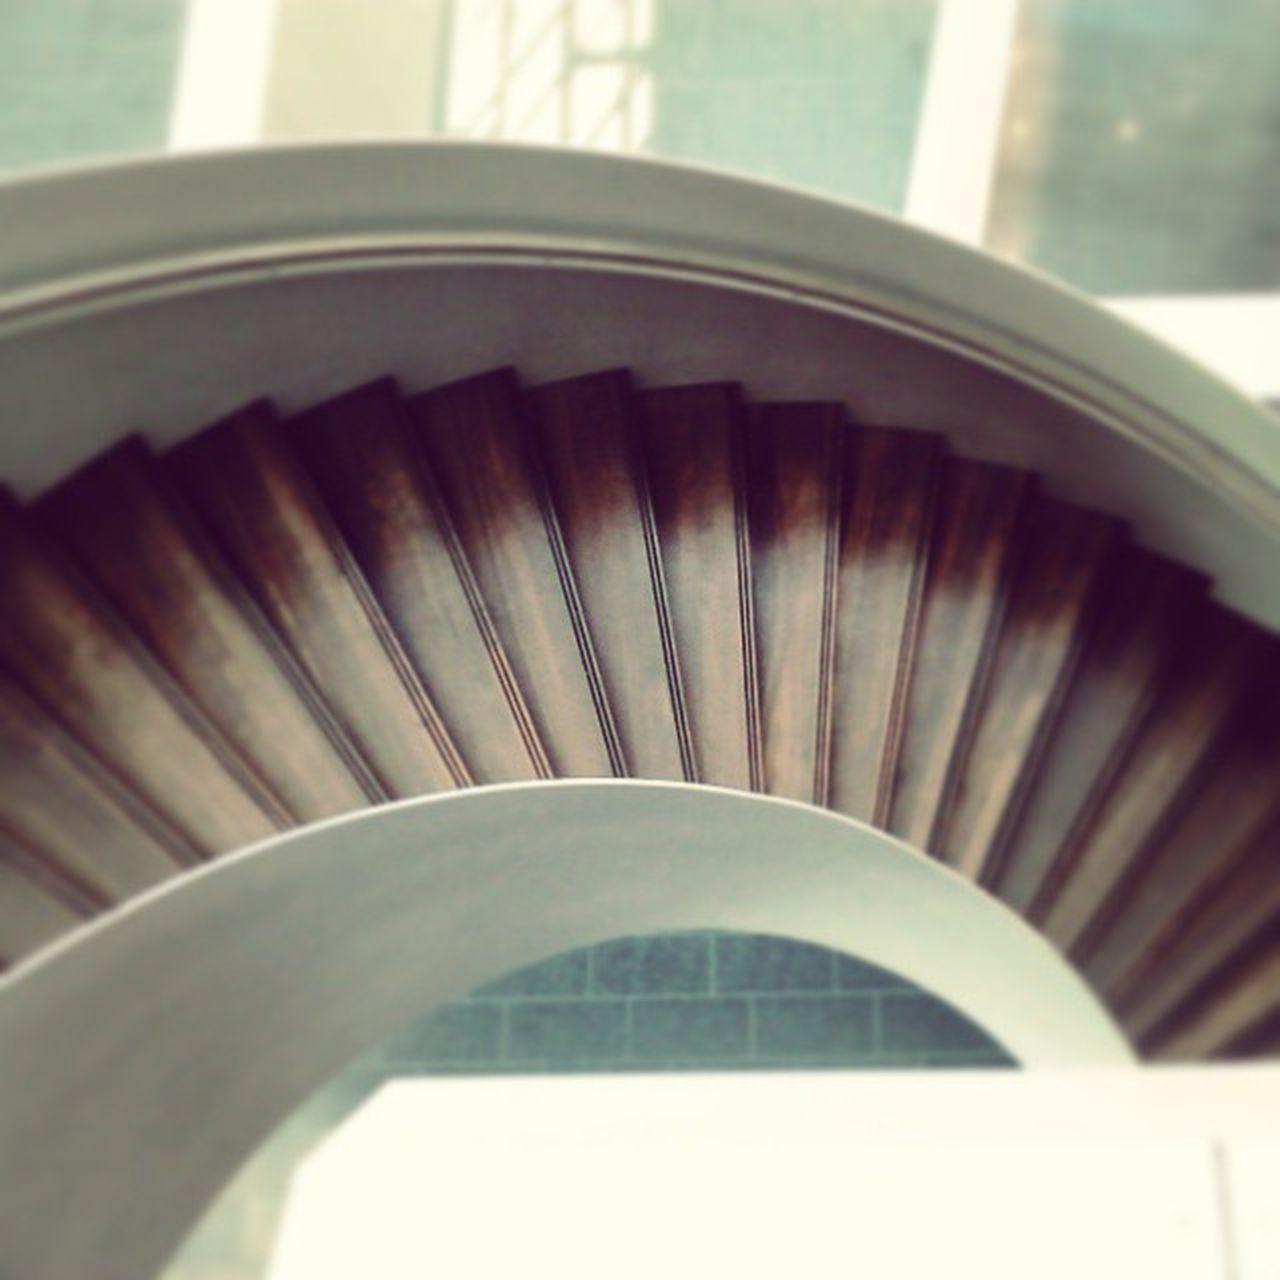 LG_keresdazivet . Ish Frankfurt Mik Stairs Building Instamagyarorszag Instagramhub Arches Messefrankfurt Interiordesign Structure Arcitecture Shades Archilovers Staircase Pairofstairs Theworldneedsmorespiralstaircases Stairsandsteps Archdaily Minimalism Pickoftheday Shadow